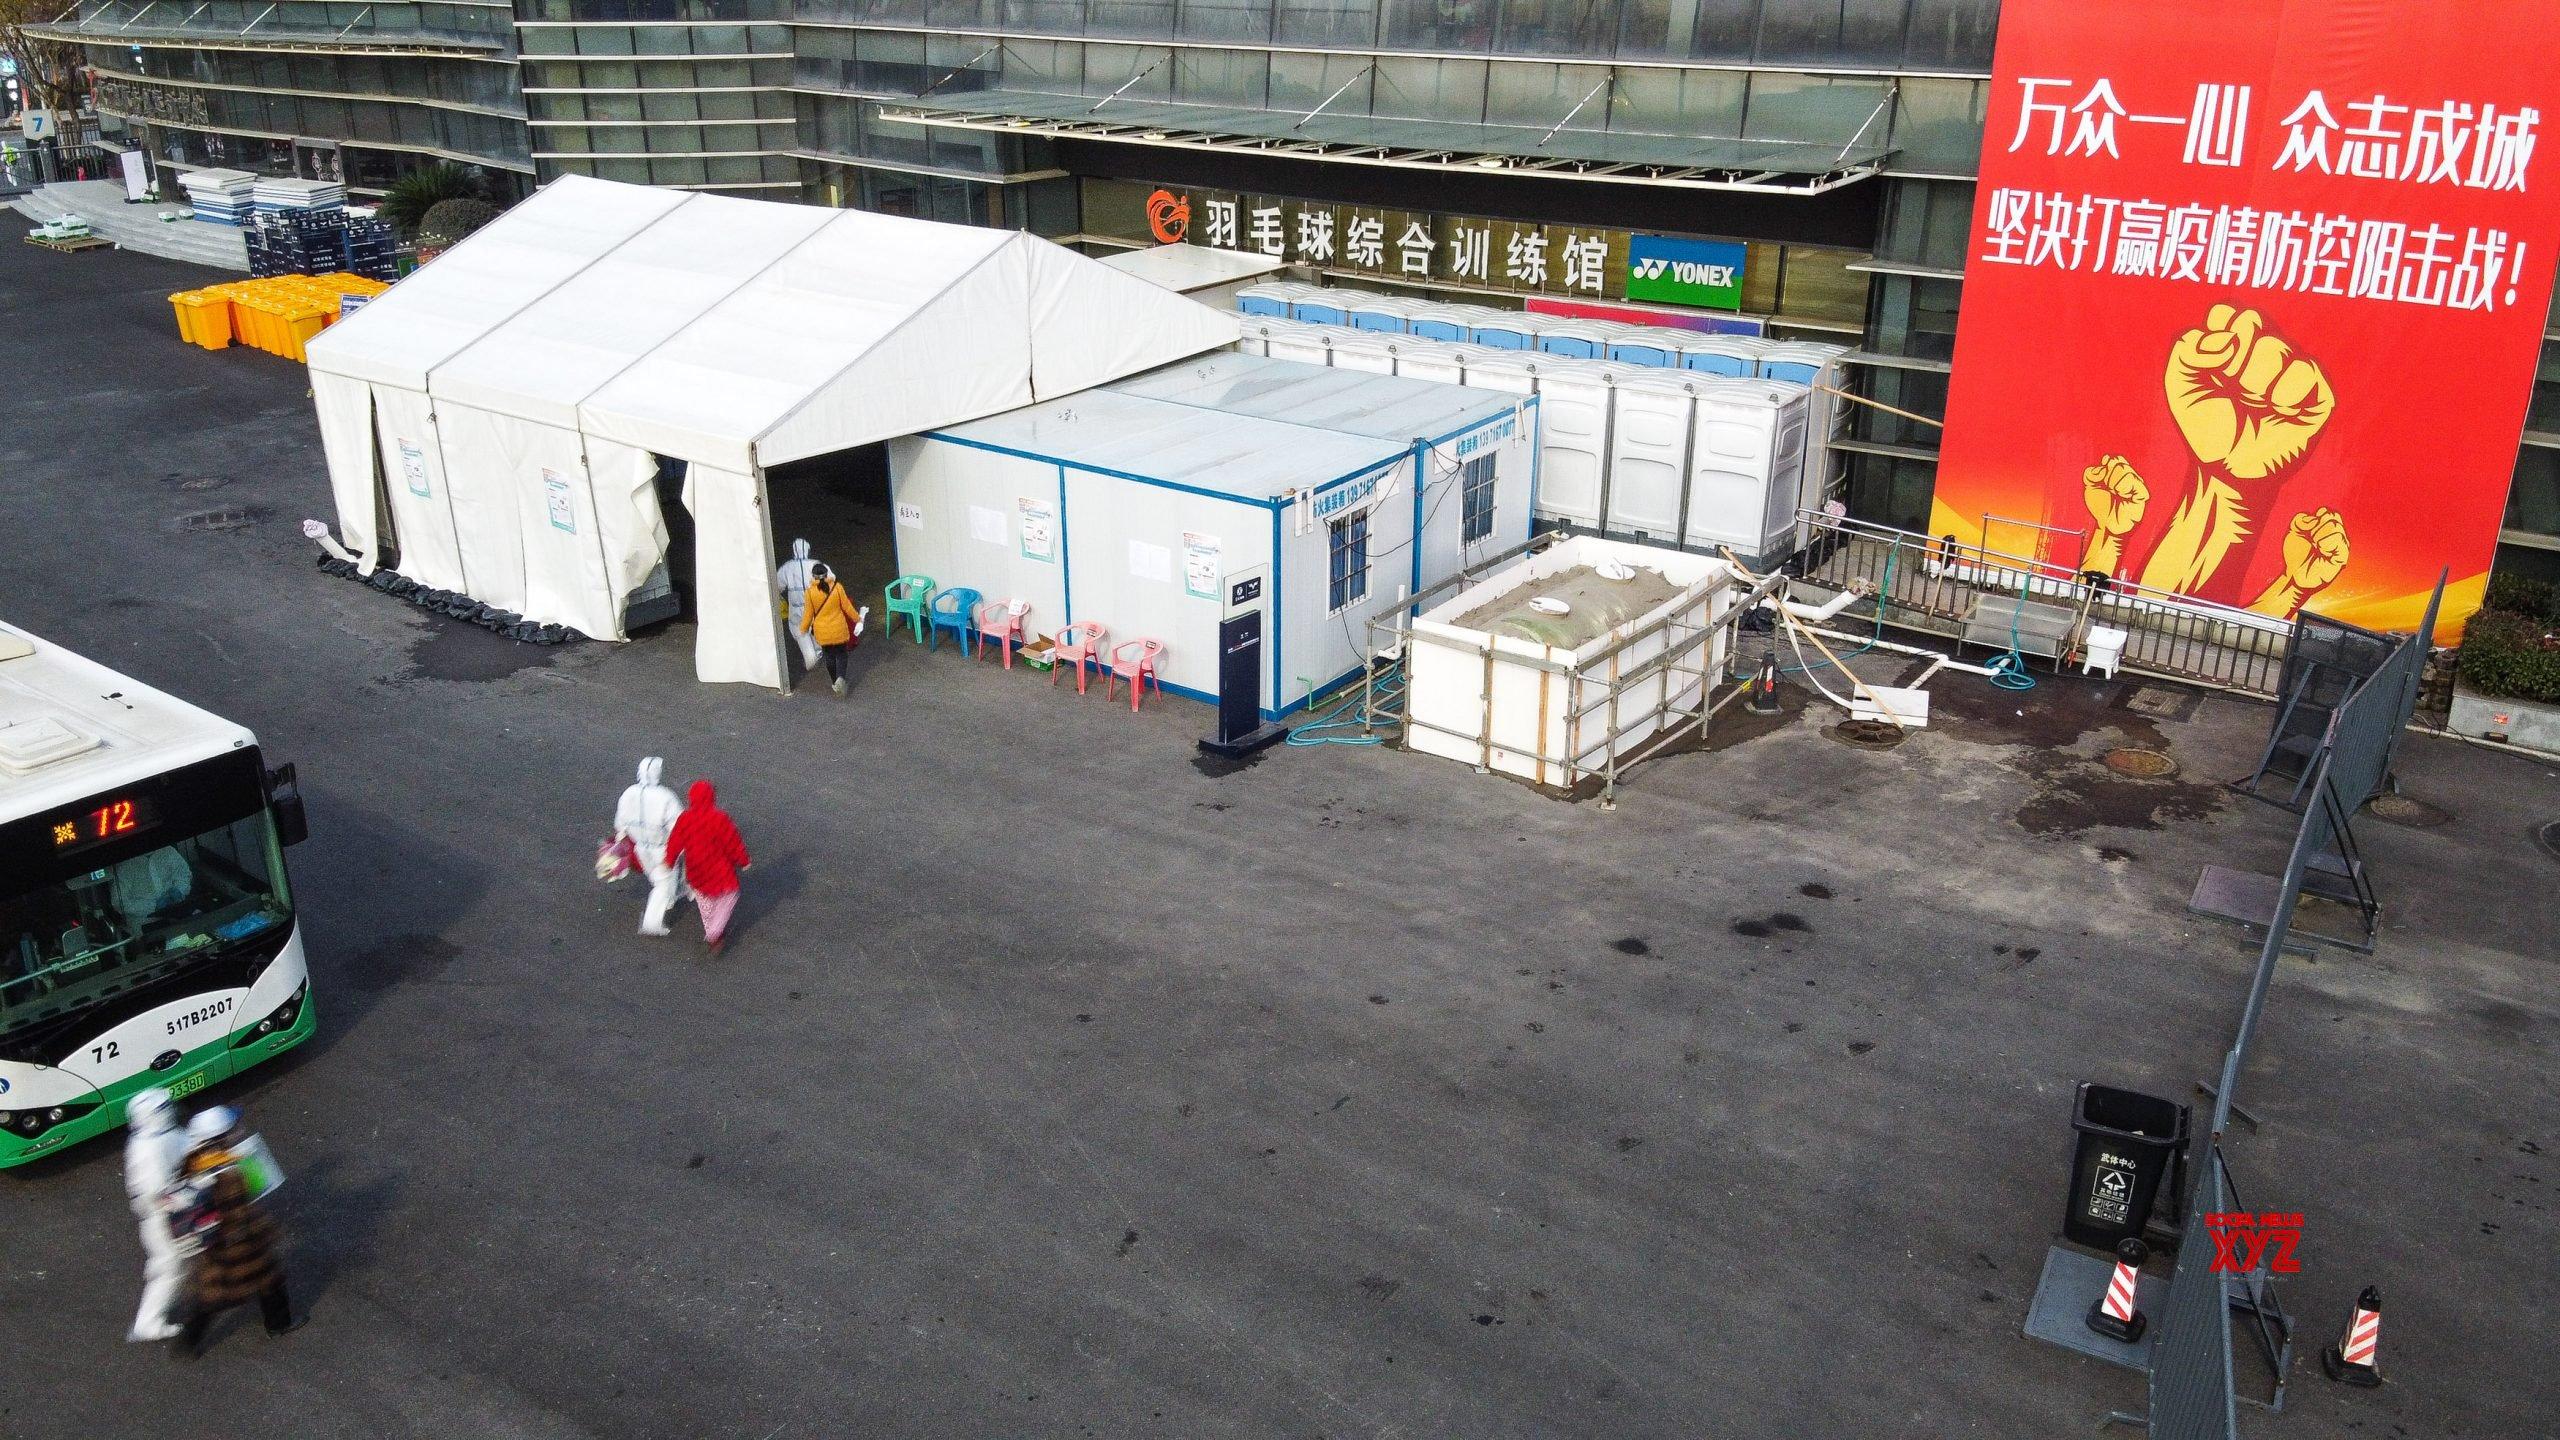 9 temporary hospitals open in epidemic-stricken Hubei